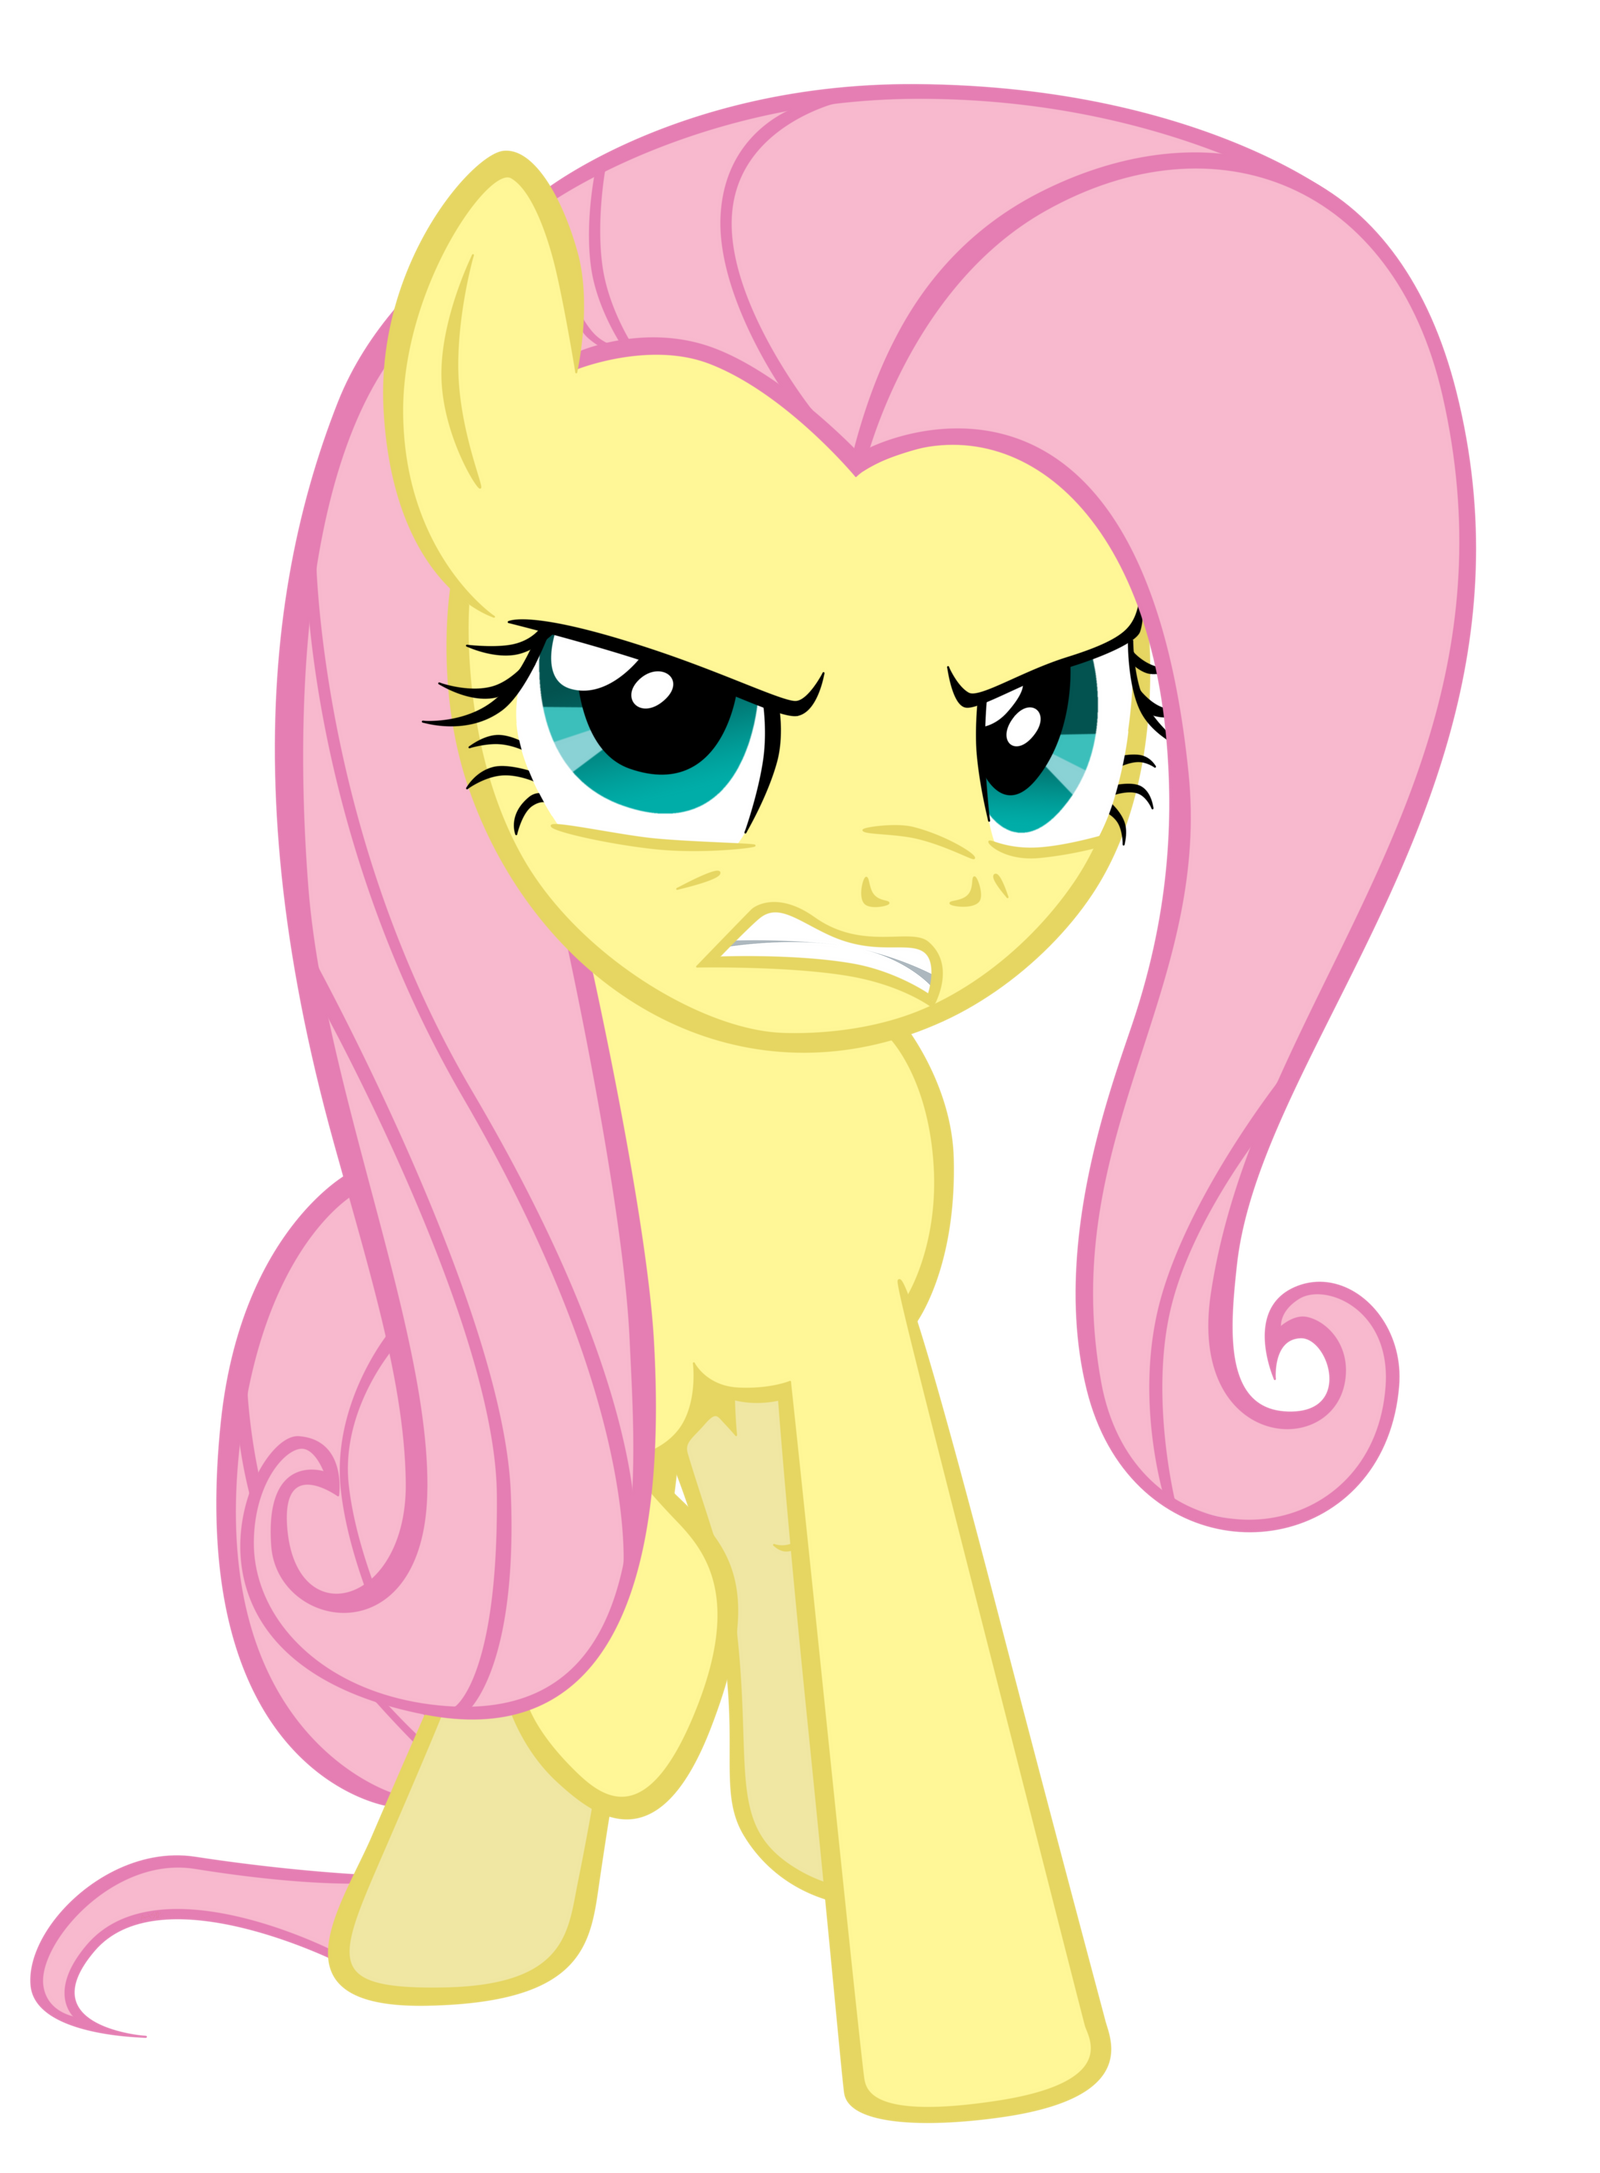 Fluttershy's Rage by ABadCookie on DeviantArt